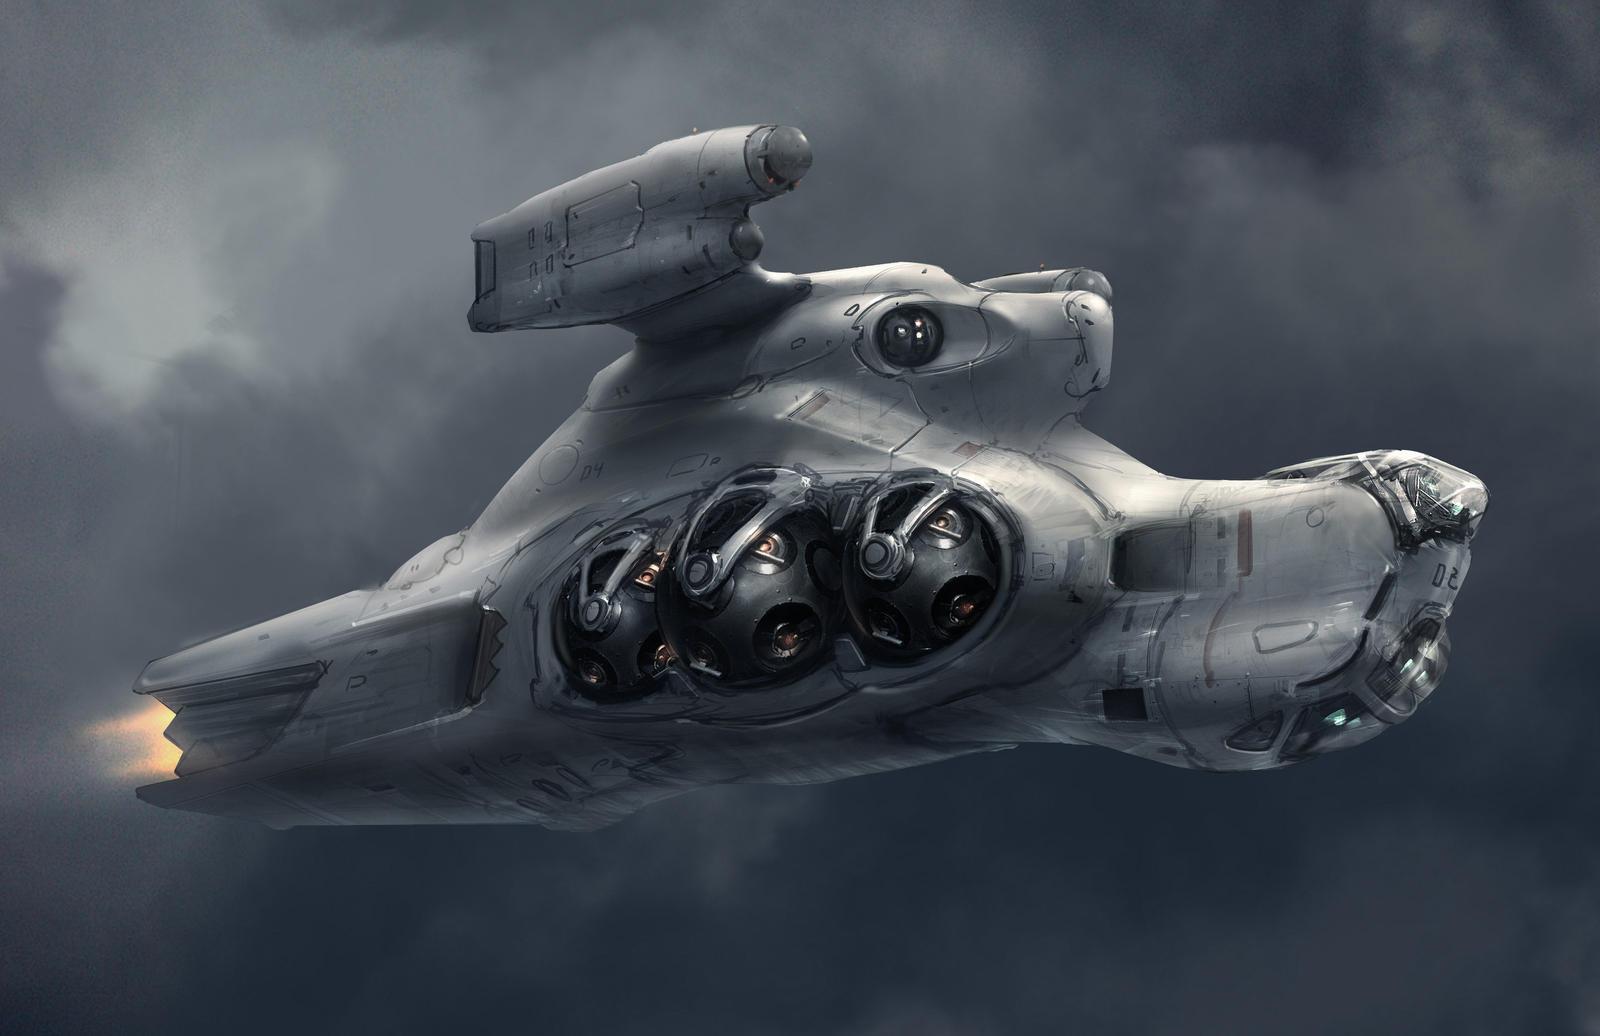 gun ship by ProgV